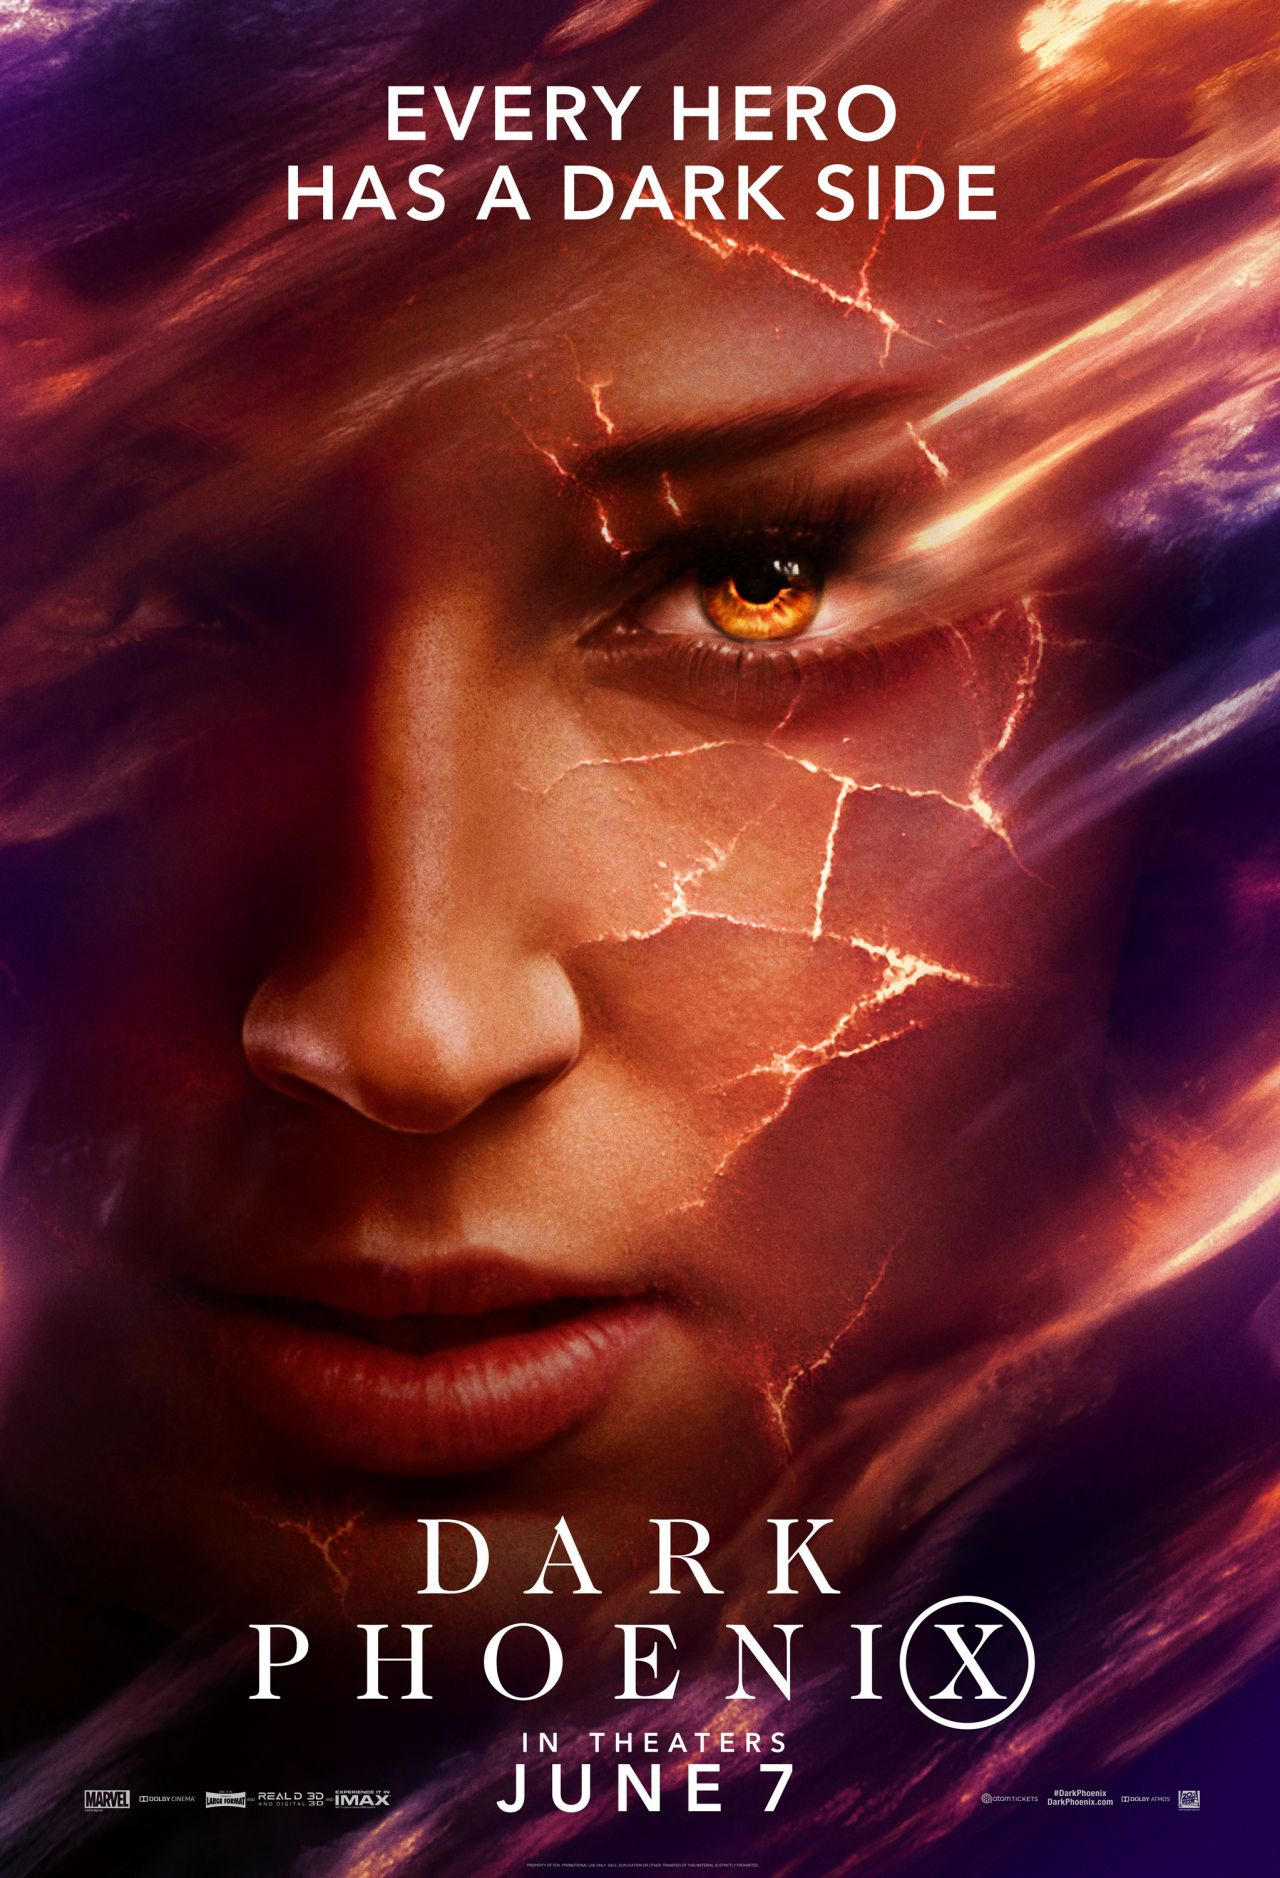 Sophie Turner Quot Dark Phoenix Quot Promotional Posters